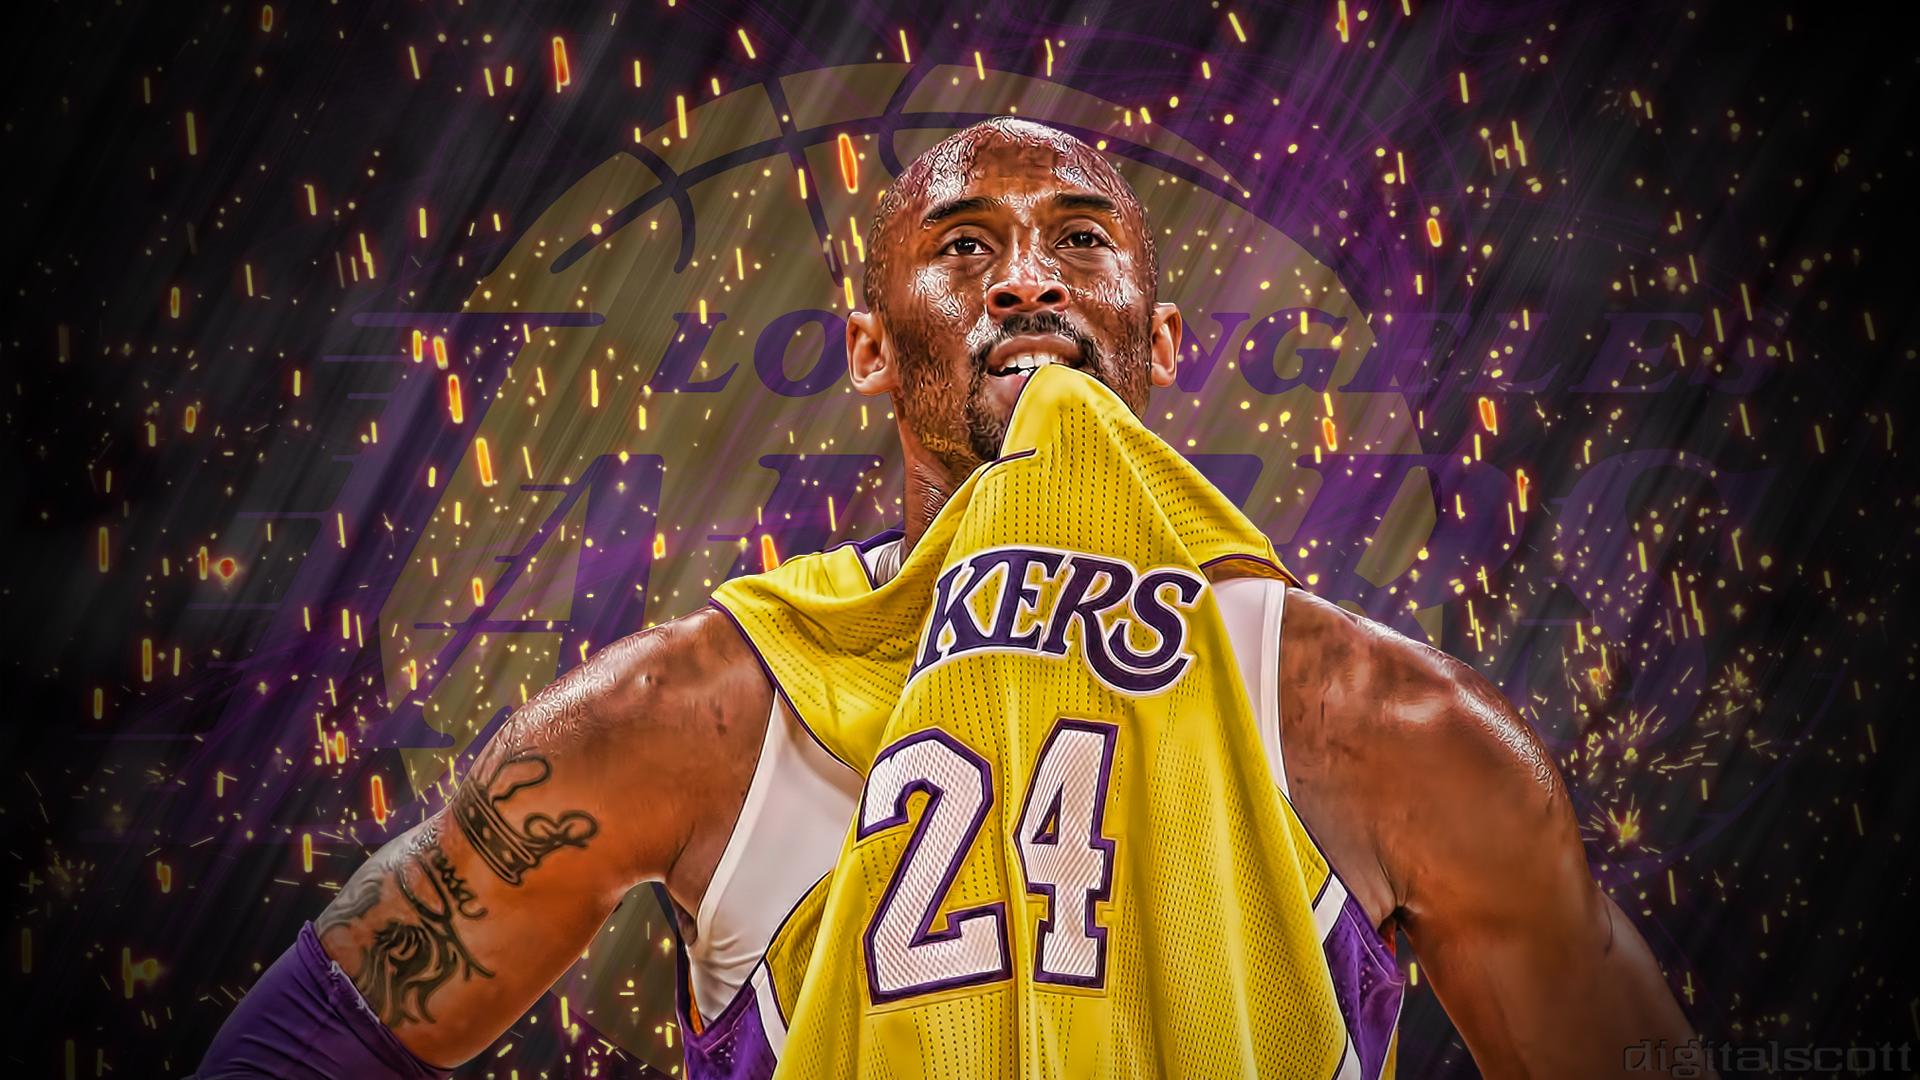 Kobe Bryant Free Computer Wallpaper Kobe Bryant Wallpaper Kobe Bryant Kobe